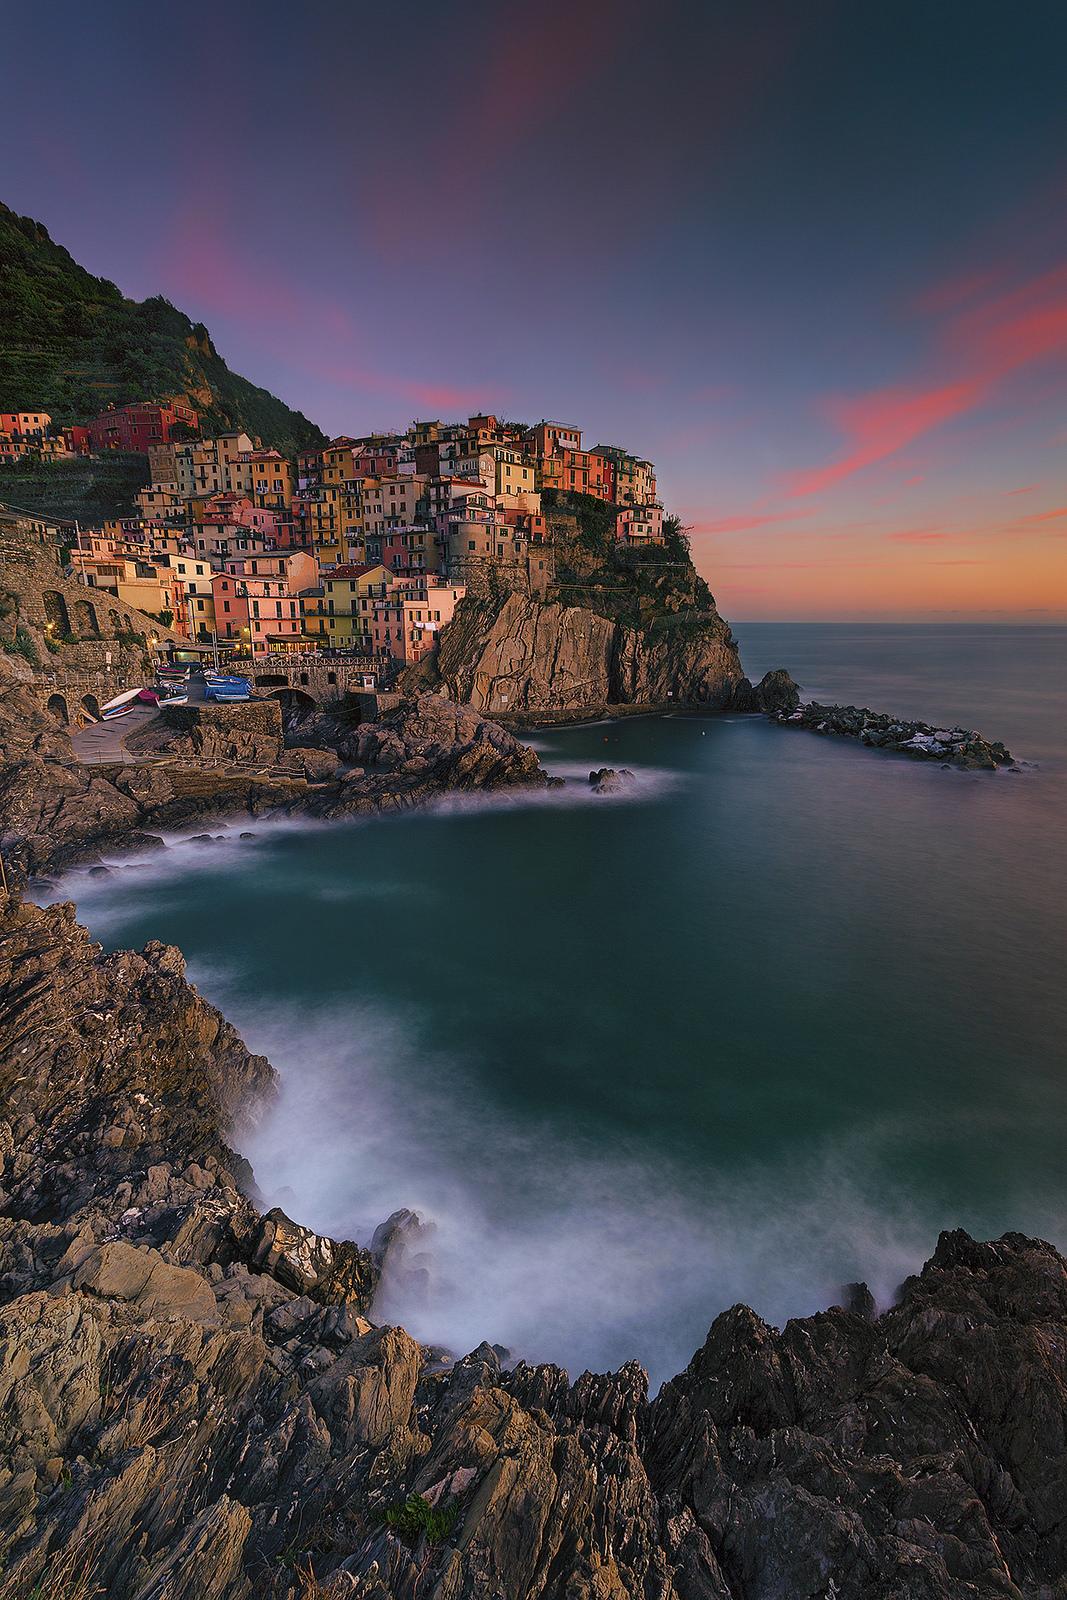 positano italy village houses colorful retina wallpaper